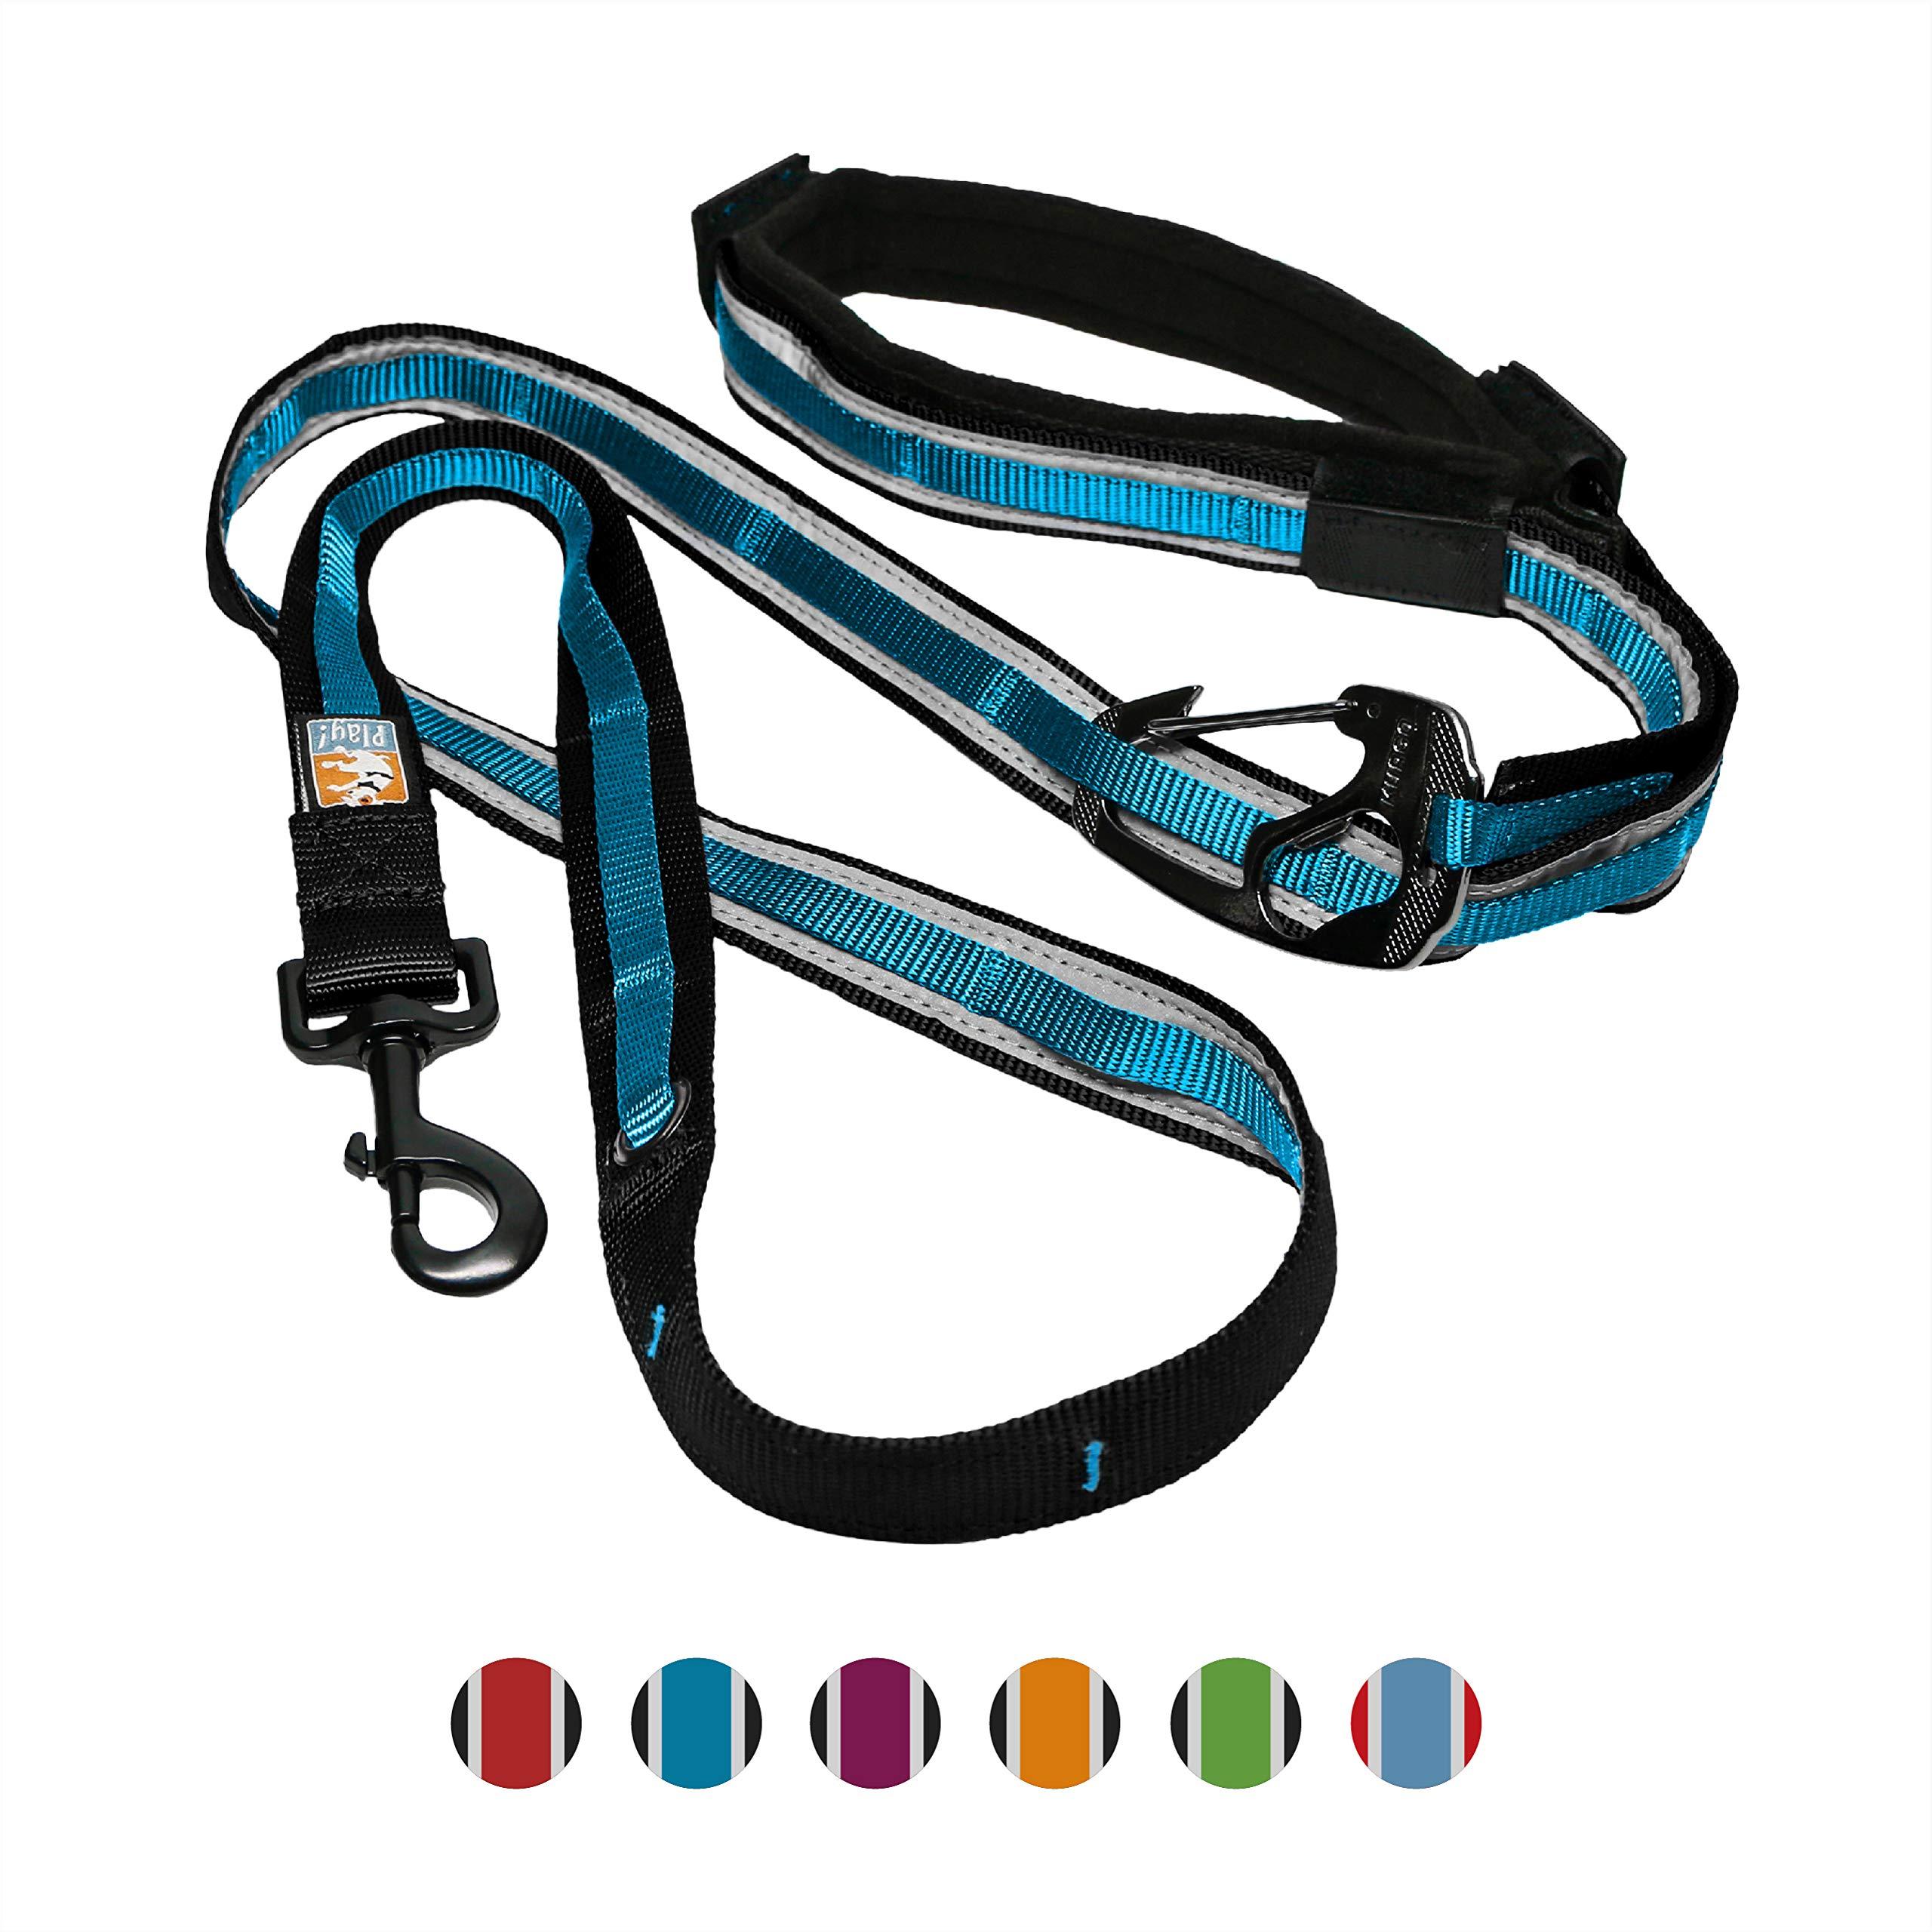 Kurgo 6 In 1 Hands Free Dog Leash   Reflective Running Belt Leash for Dogs   Crossbody & Waist Belt Leash   Carabiner  Padded Handle   for Training, Hiking, Or Jogging   Quantum Leash (Coastal Blue) by Kurgo